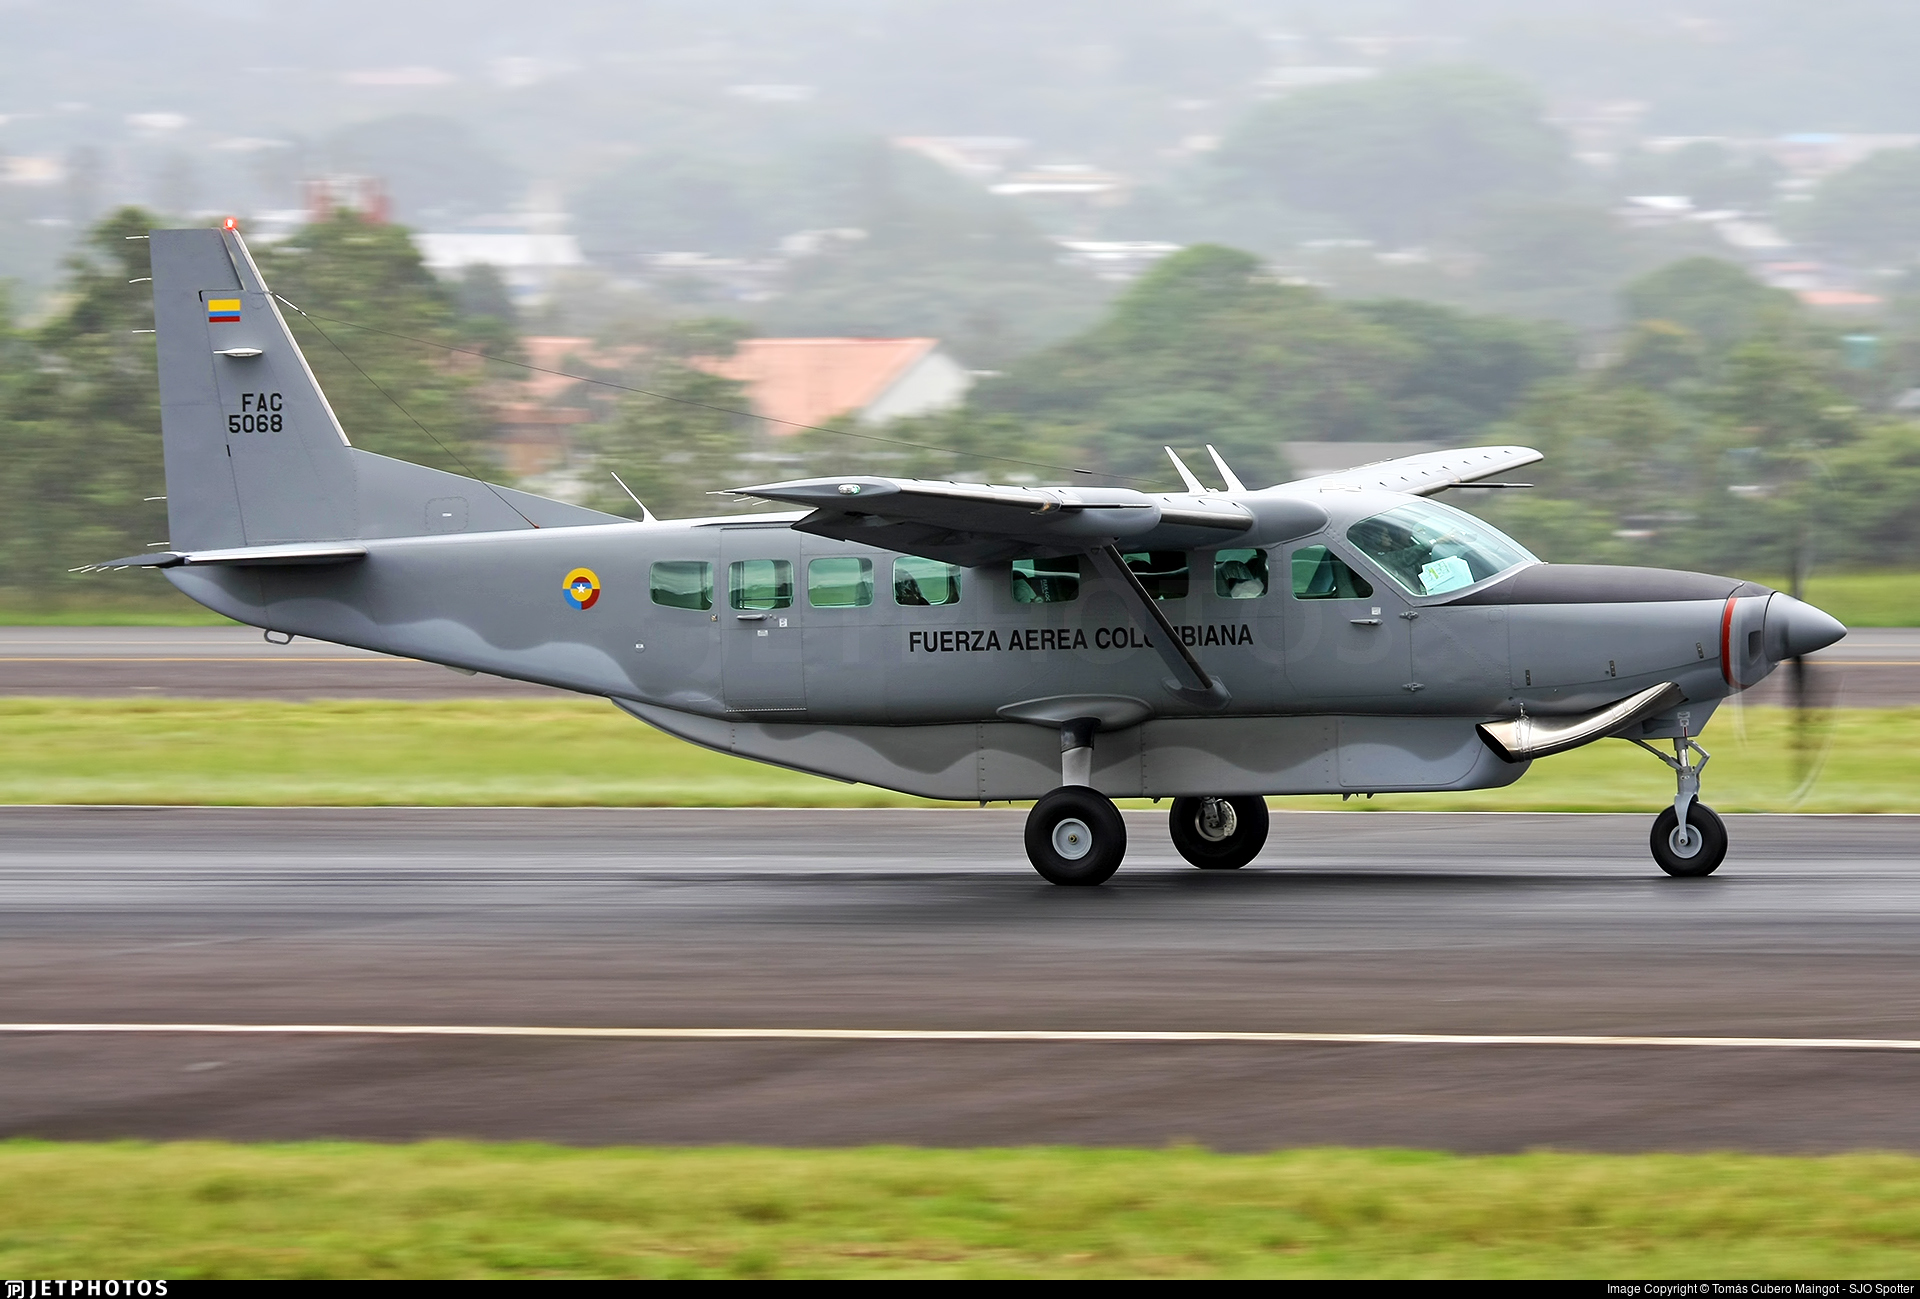 FAC5068 - Cessna 208B Grand Caravan - Colombia - Air Force